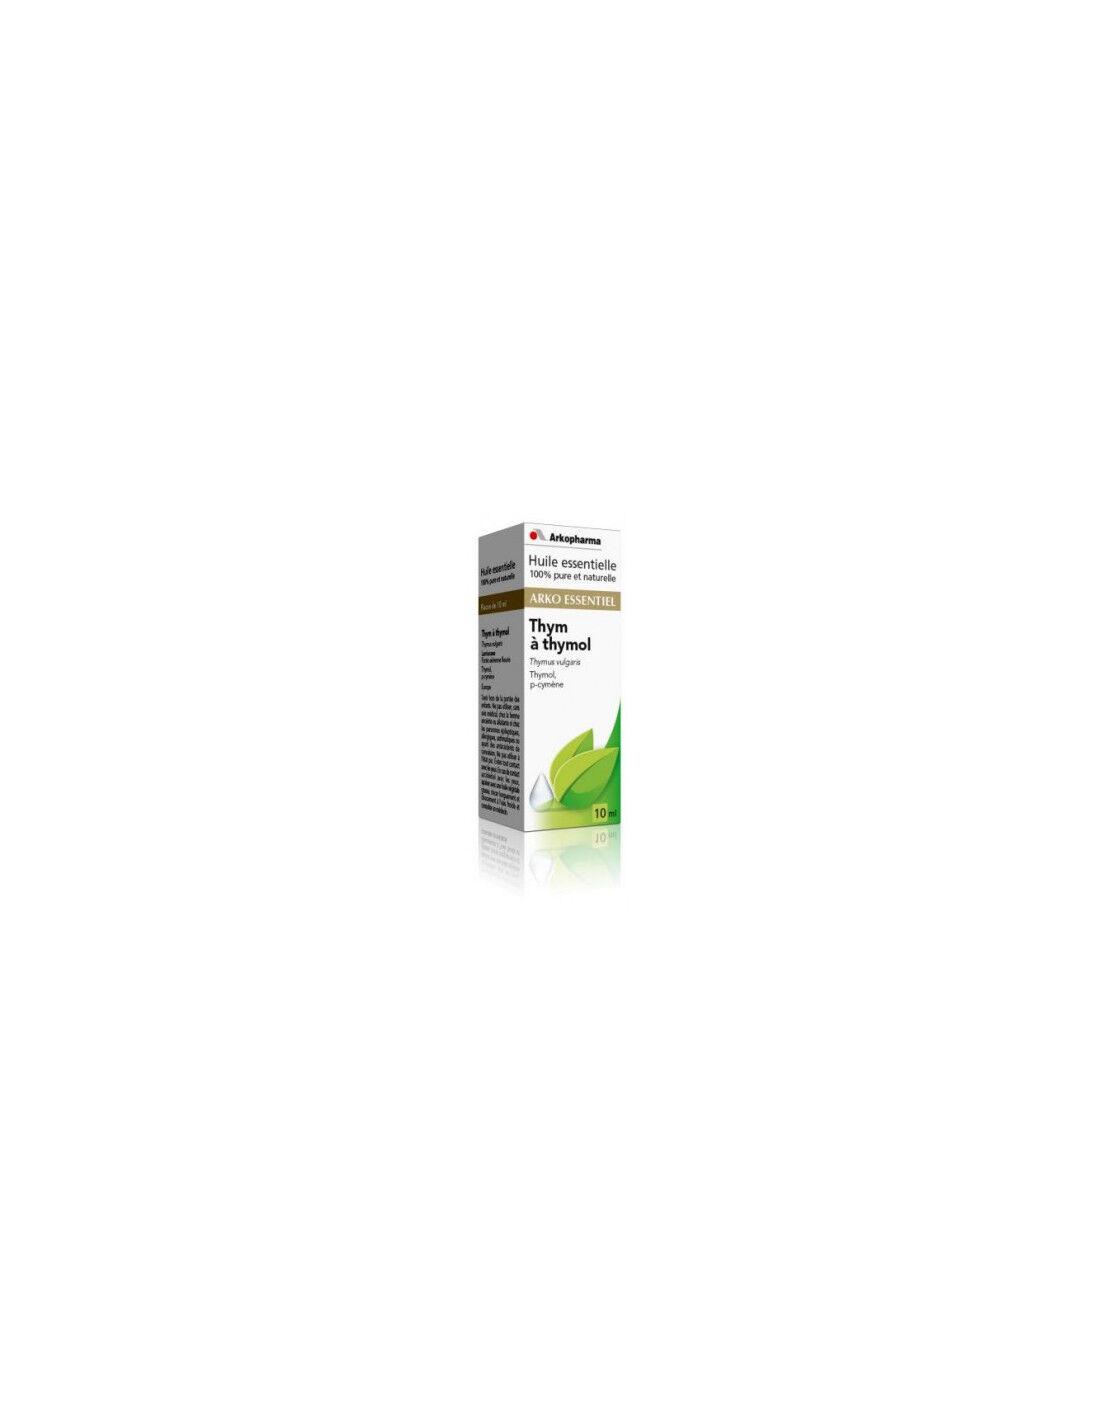 Arkopharma Arko Essentiel huile essentielle de thym à thymol 10 ml